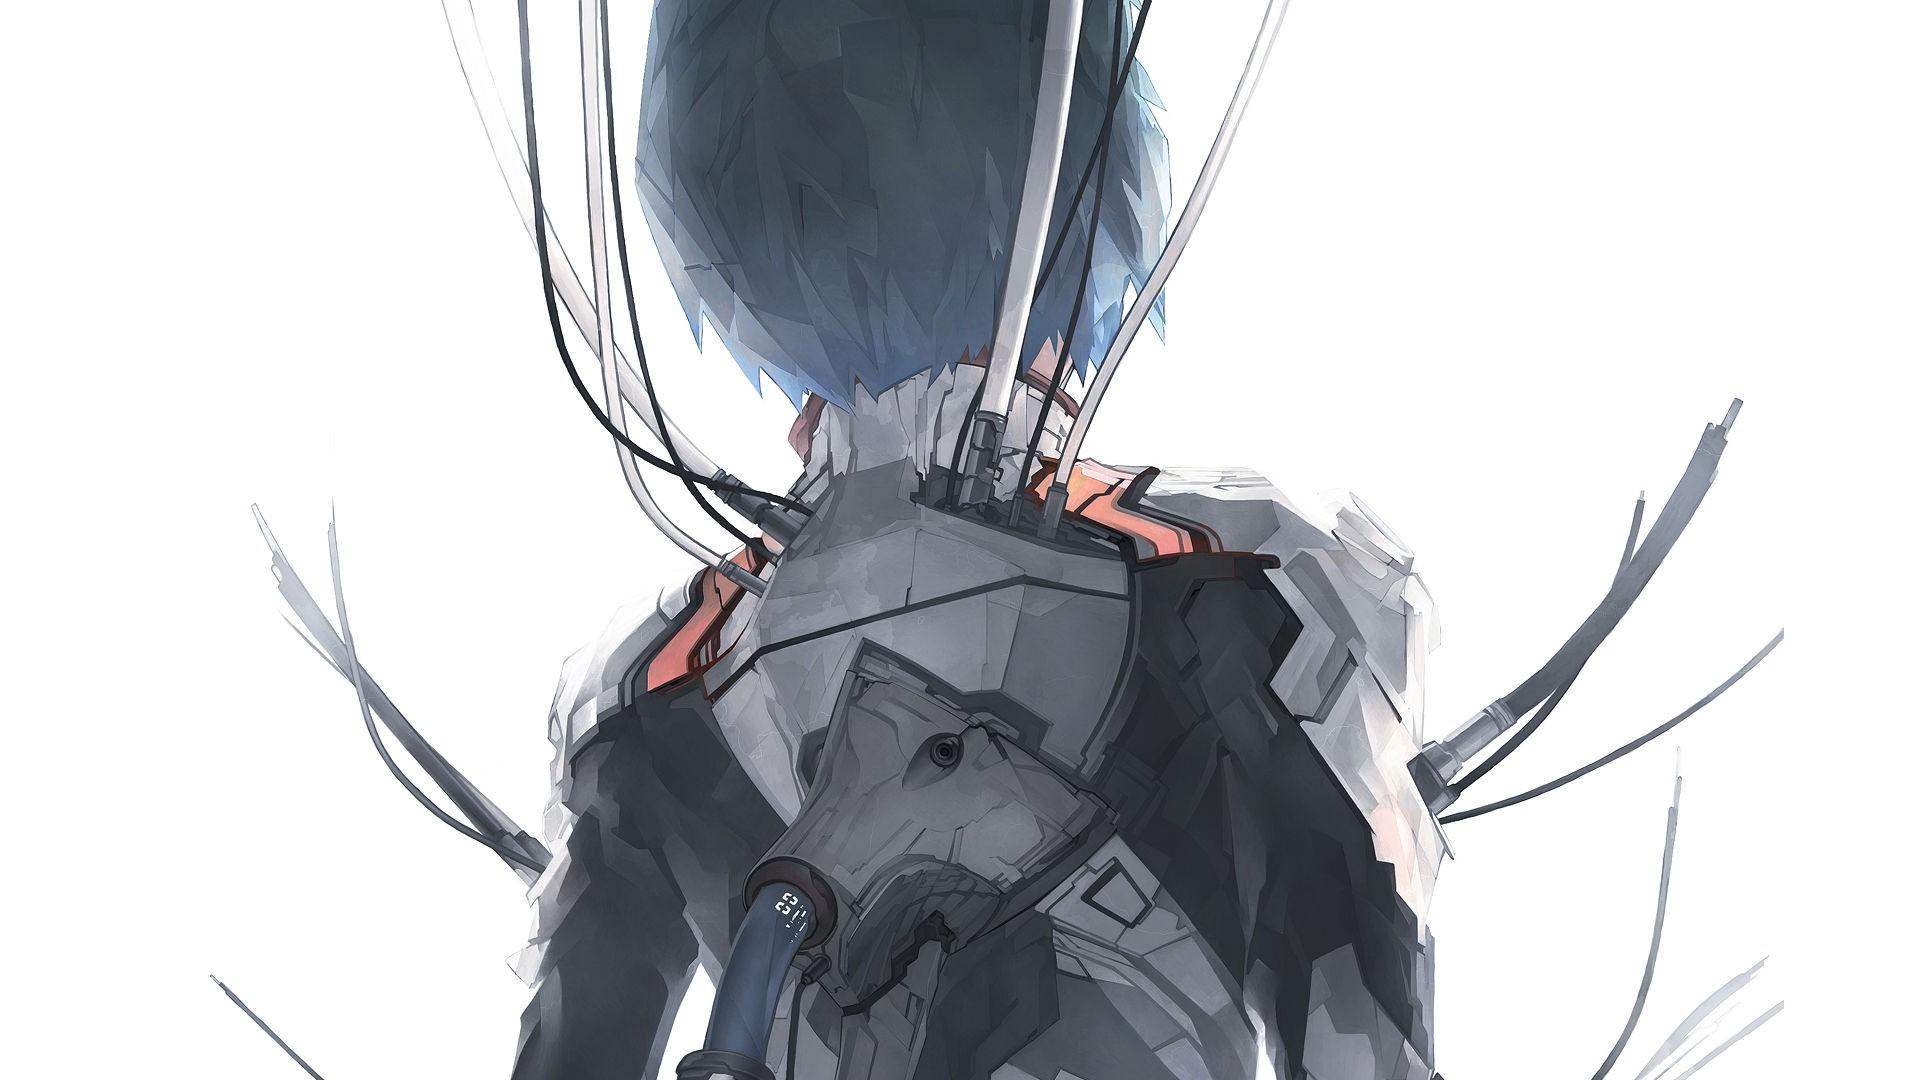 Neon Genesis Evangelion, Ayanami Rei, Wires, Solo, Simple Background  wallpaper thumb